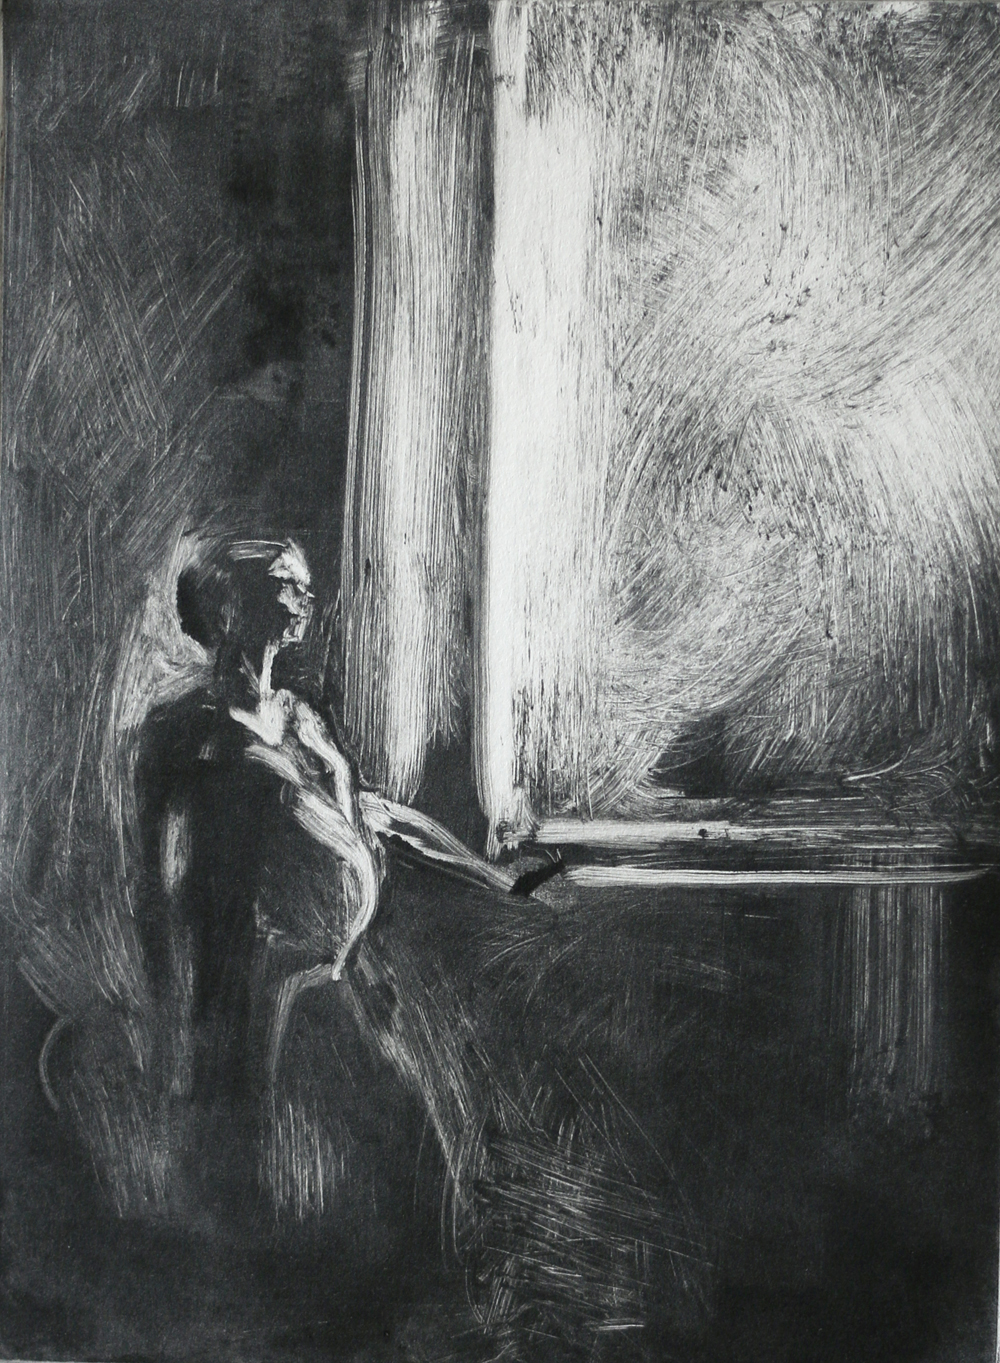 Motherhood and Art-Making